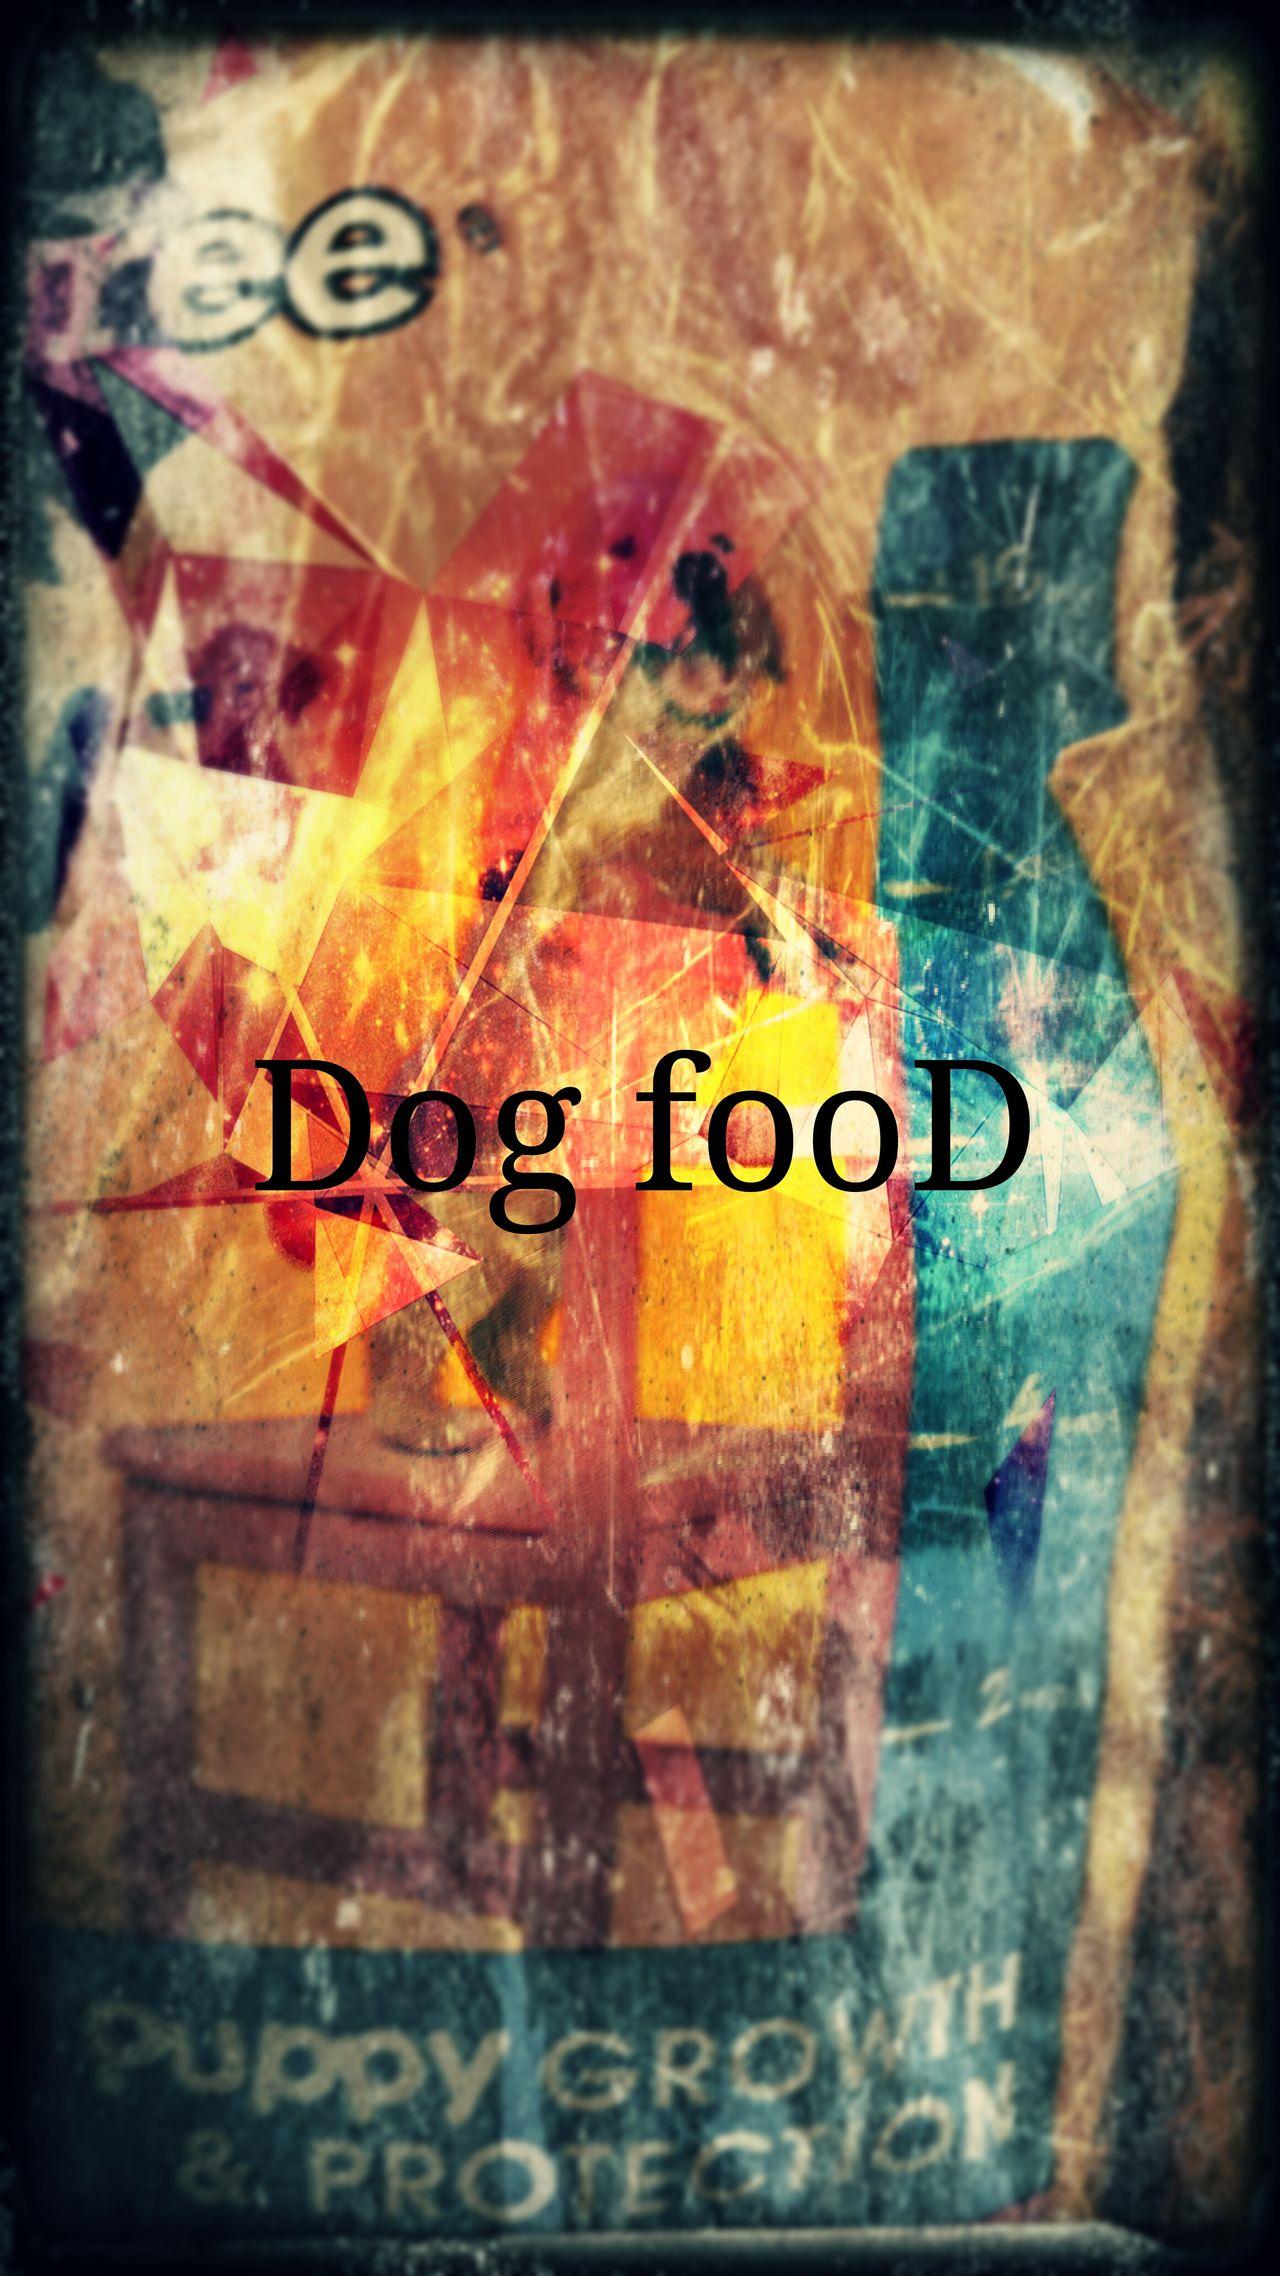 Dog food Chaotic Surrealist Art Dog Food Scratched Bizarre